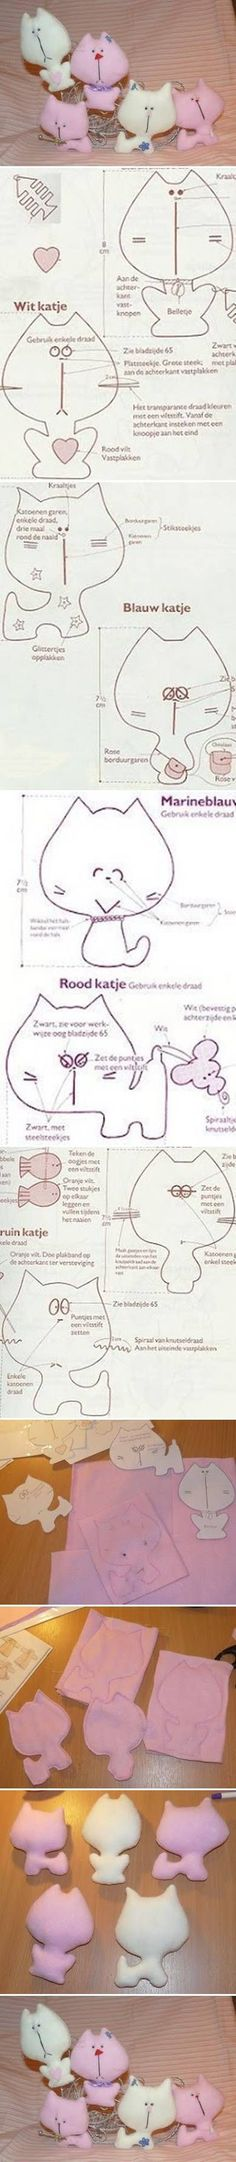 DIY Cute Little Fabric Cats DIY Projects | UsefulDIY.com Follow Us on Facebook --> https://www.facebook.com/UsefulDiy